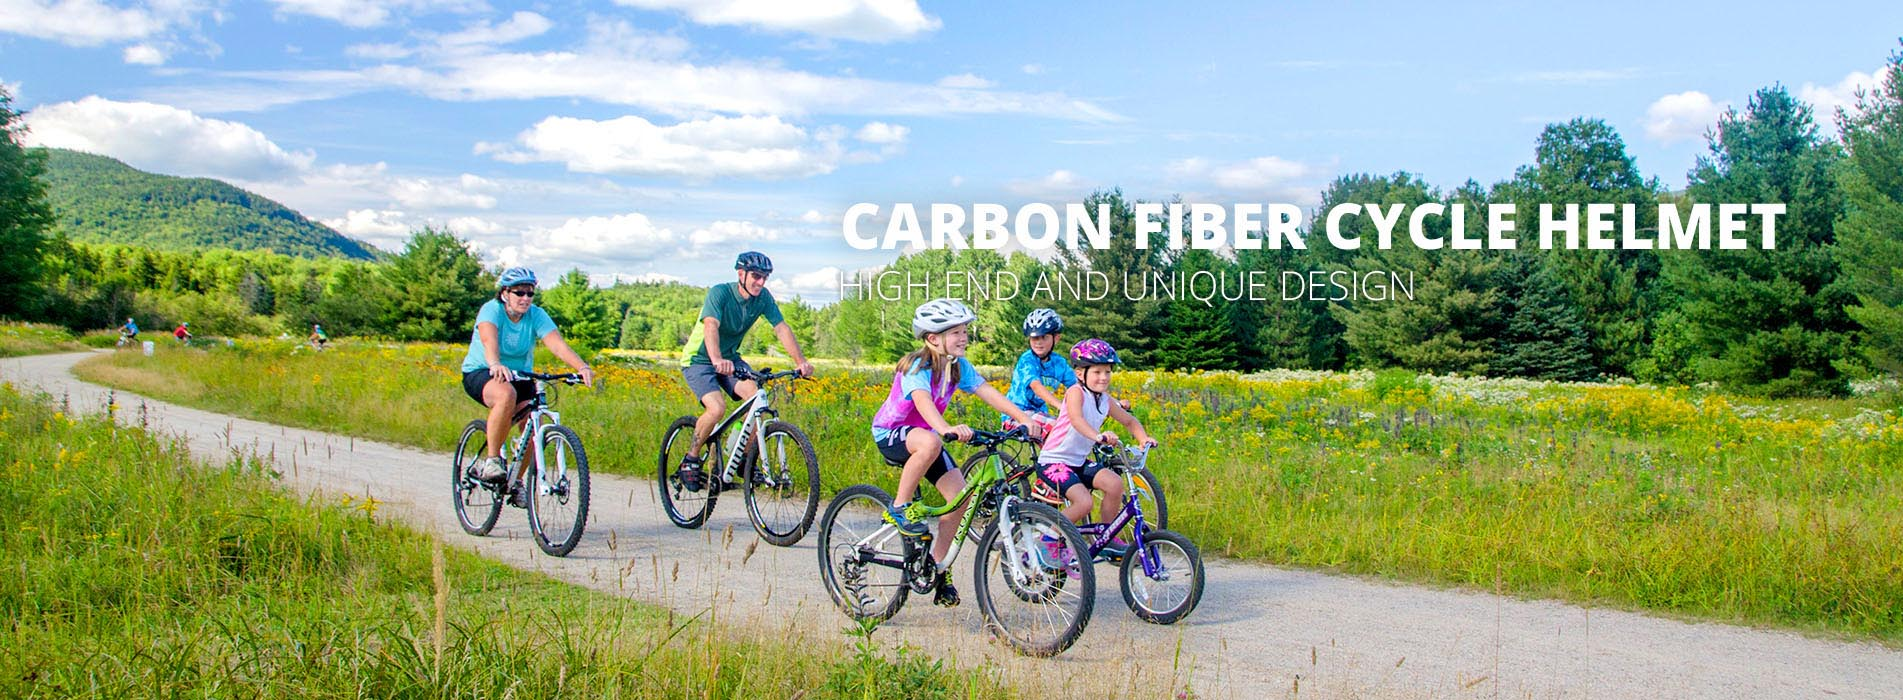 carbon fiber cycle helmet banner